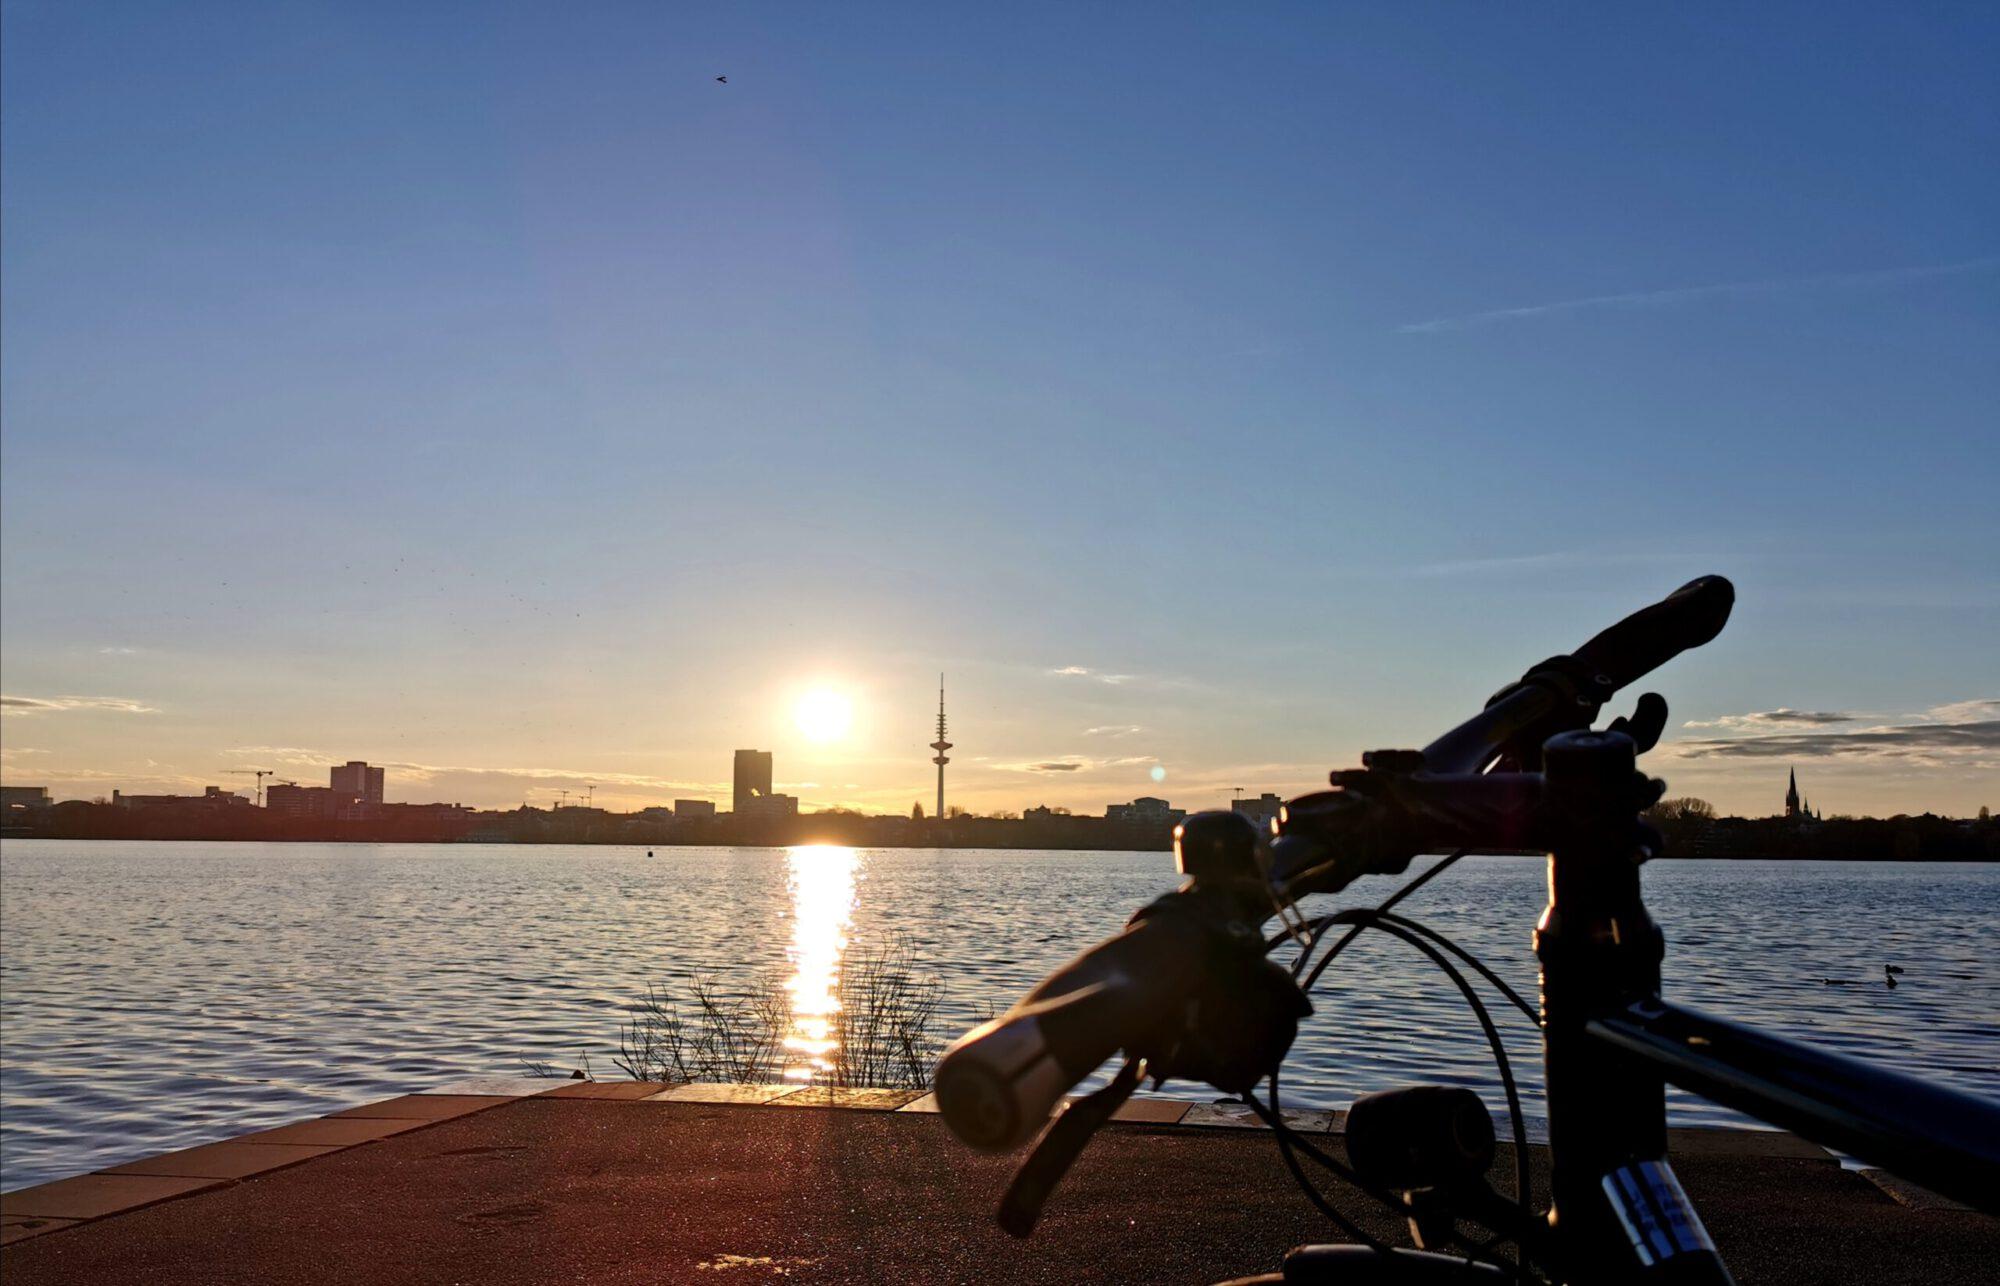 hamburgfiets - Abenteuer mit Rad